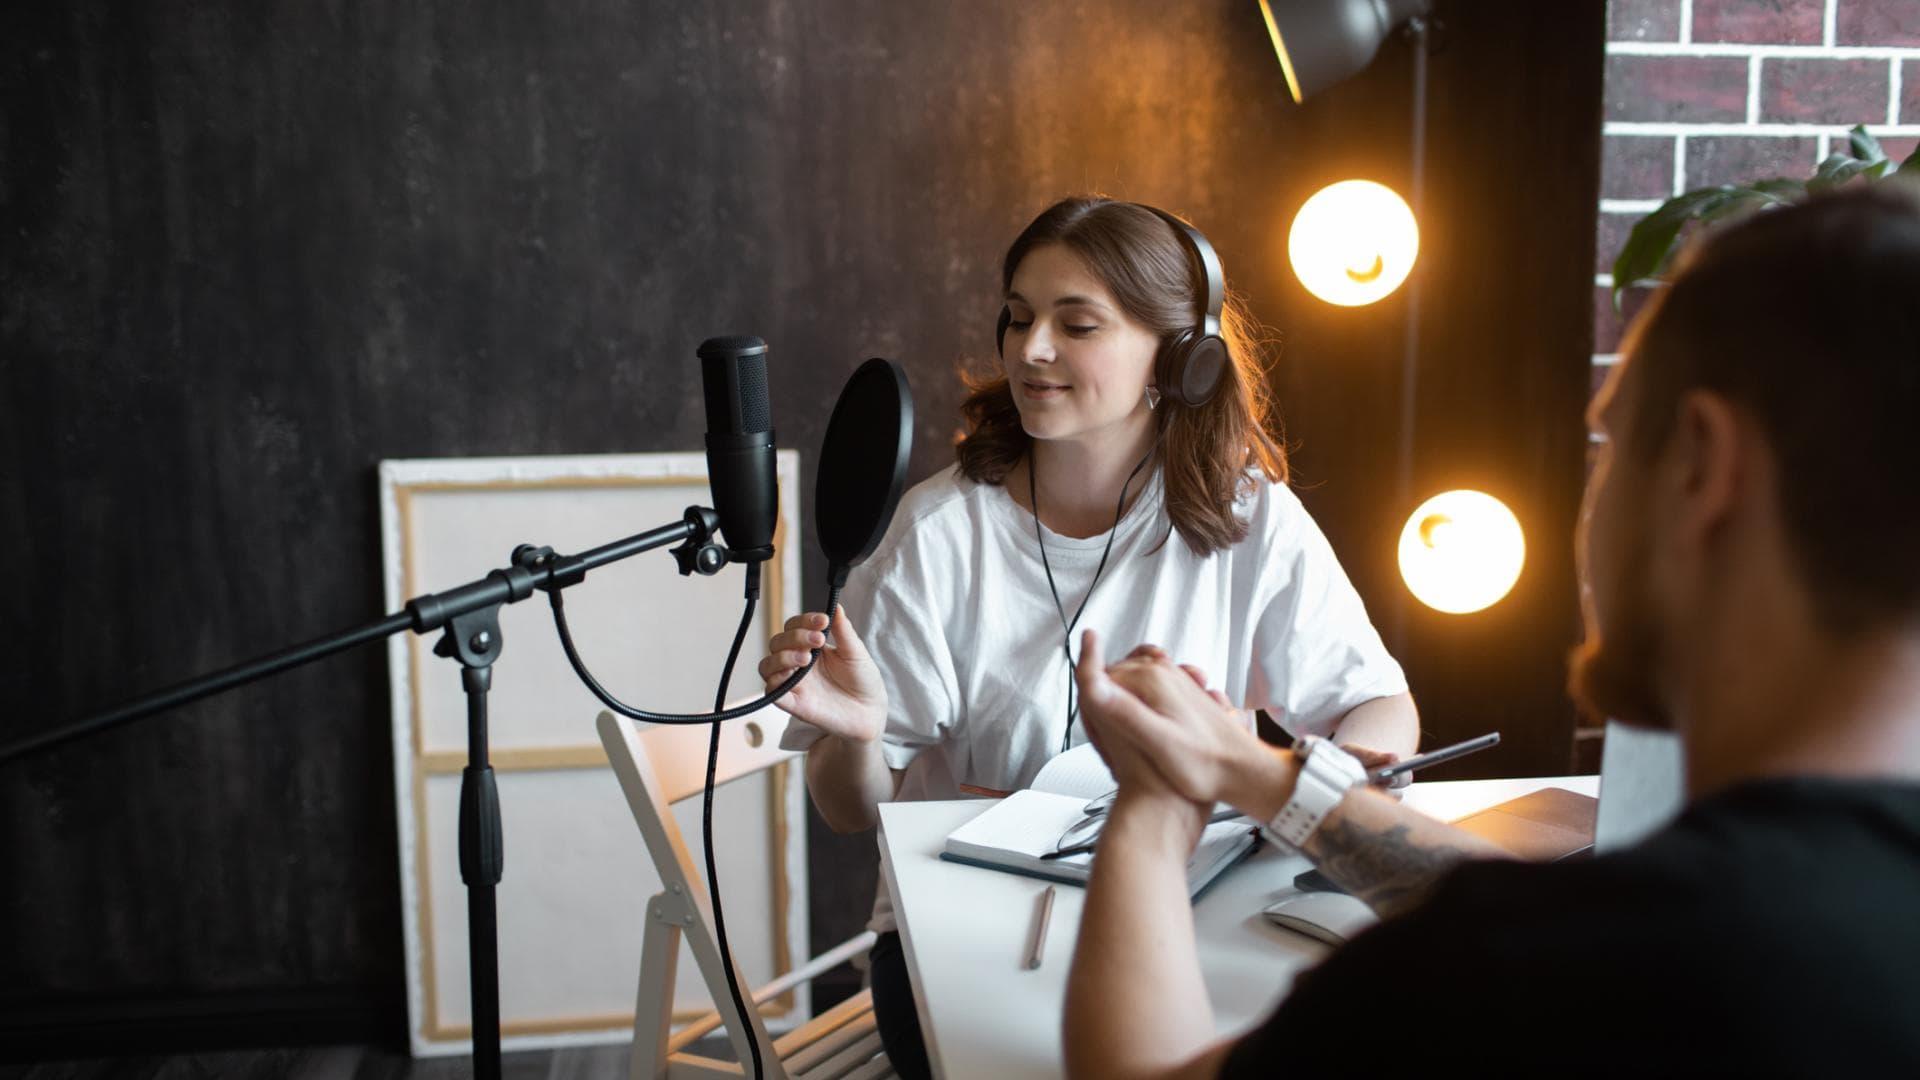 junge Frau podcast mikrofon